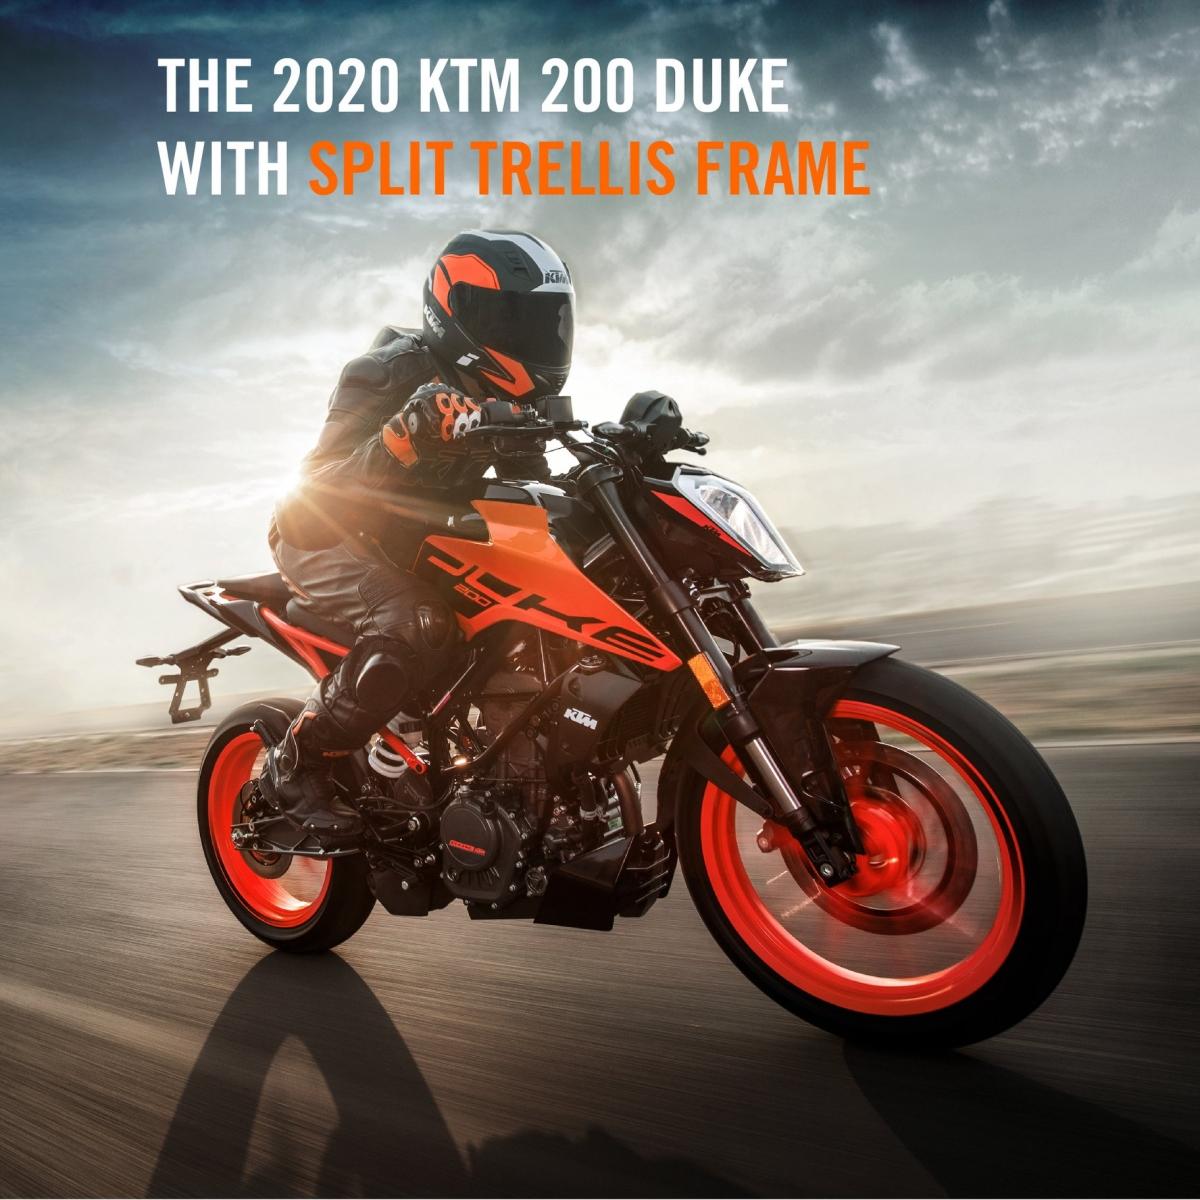 МОТОЦИКЛ KTM DUKE 200 + ABS  Артмото - купить квадроцикл в украине и харькове, мотоцикл, снегоход, скутер, мопед, электромобиль